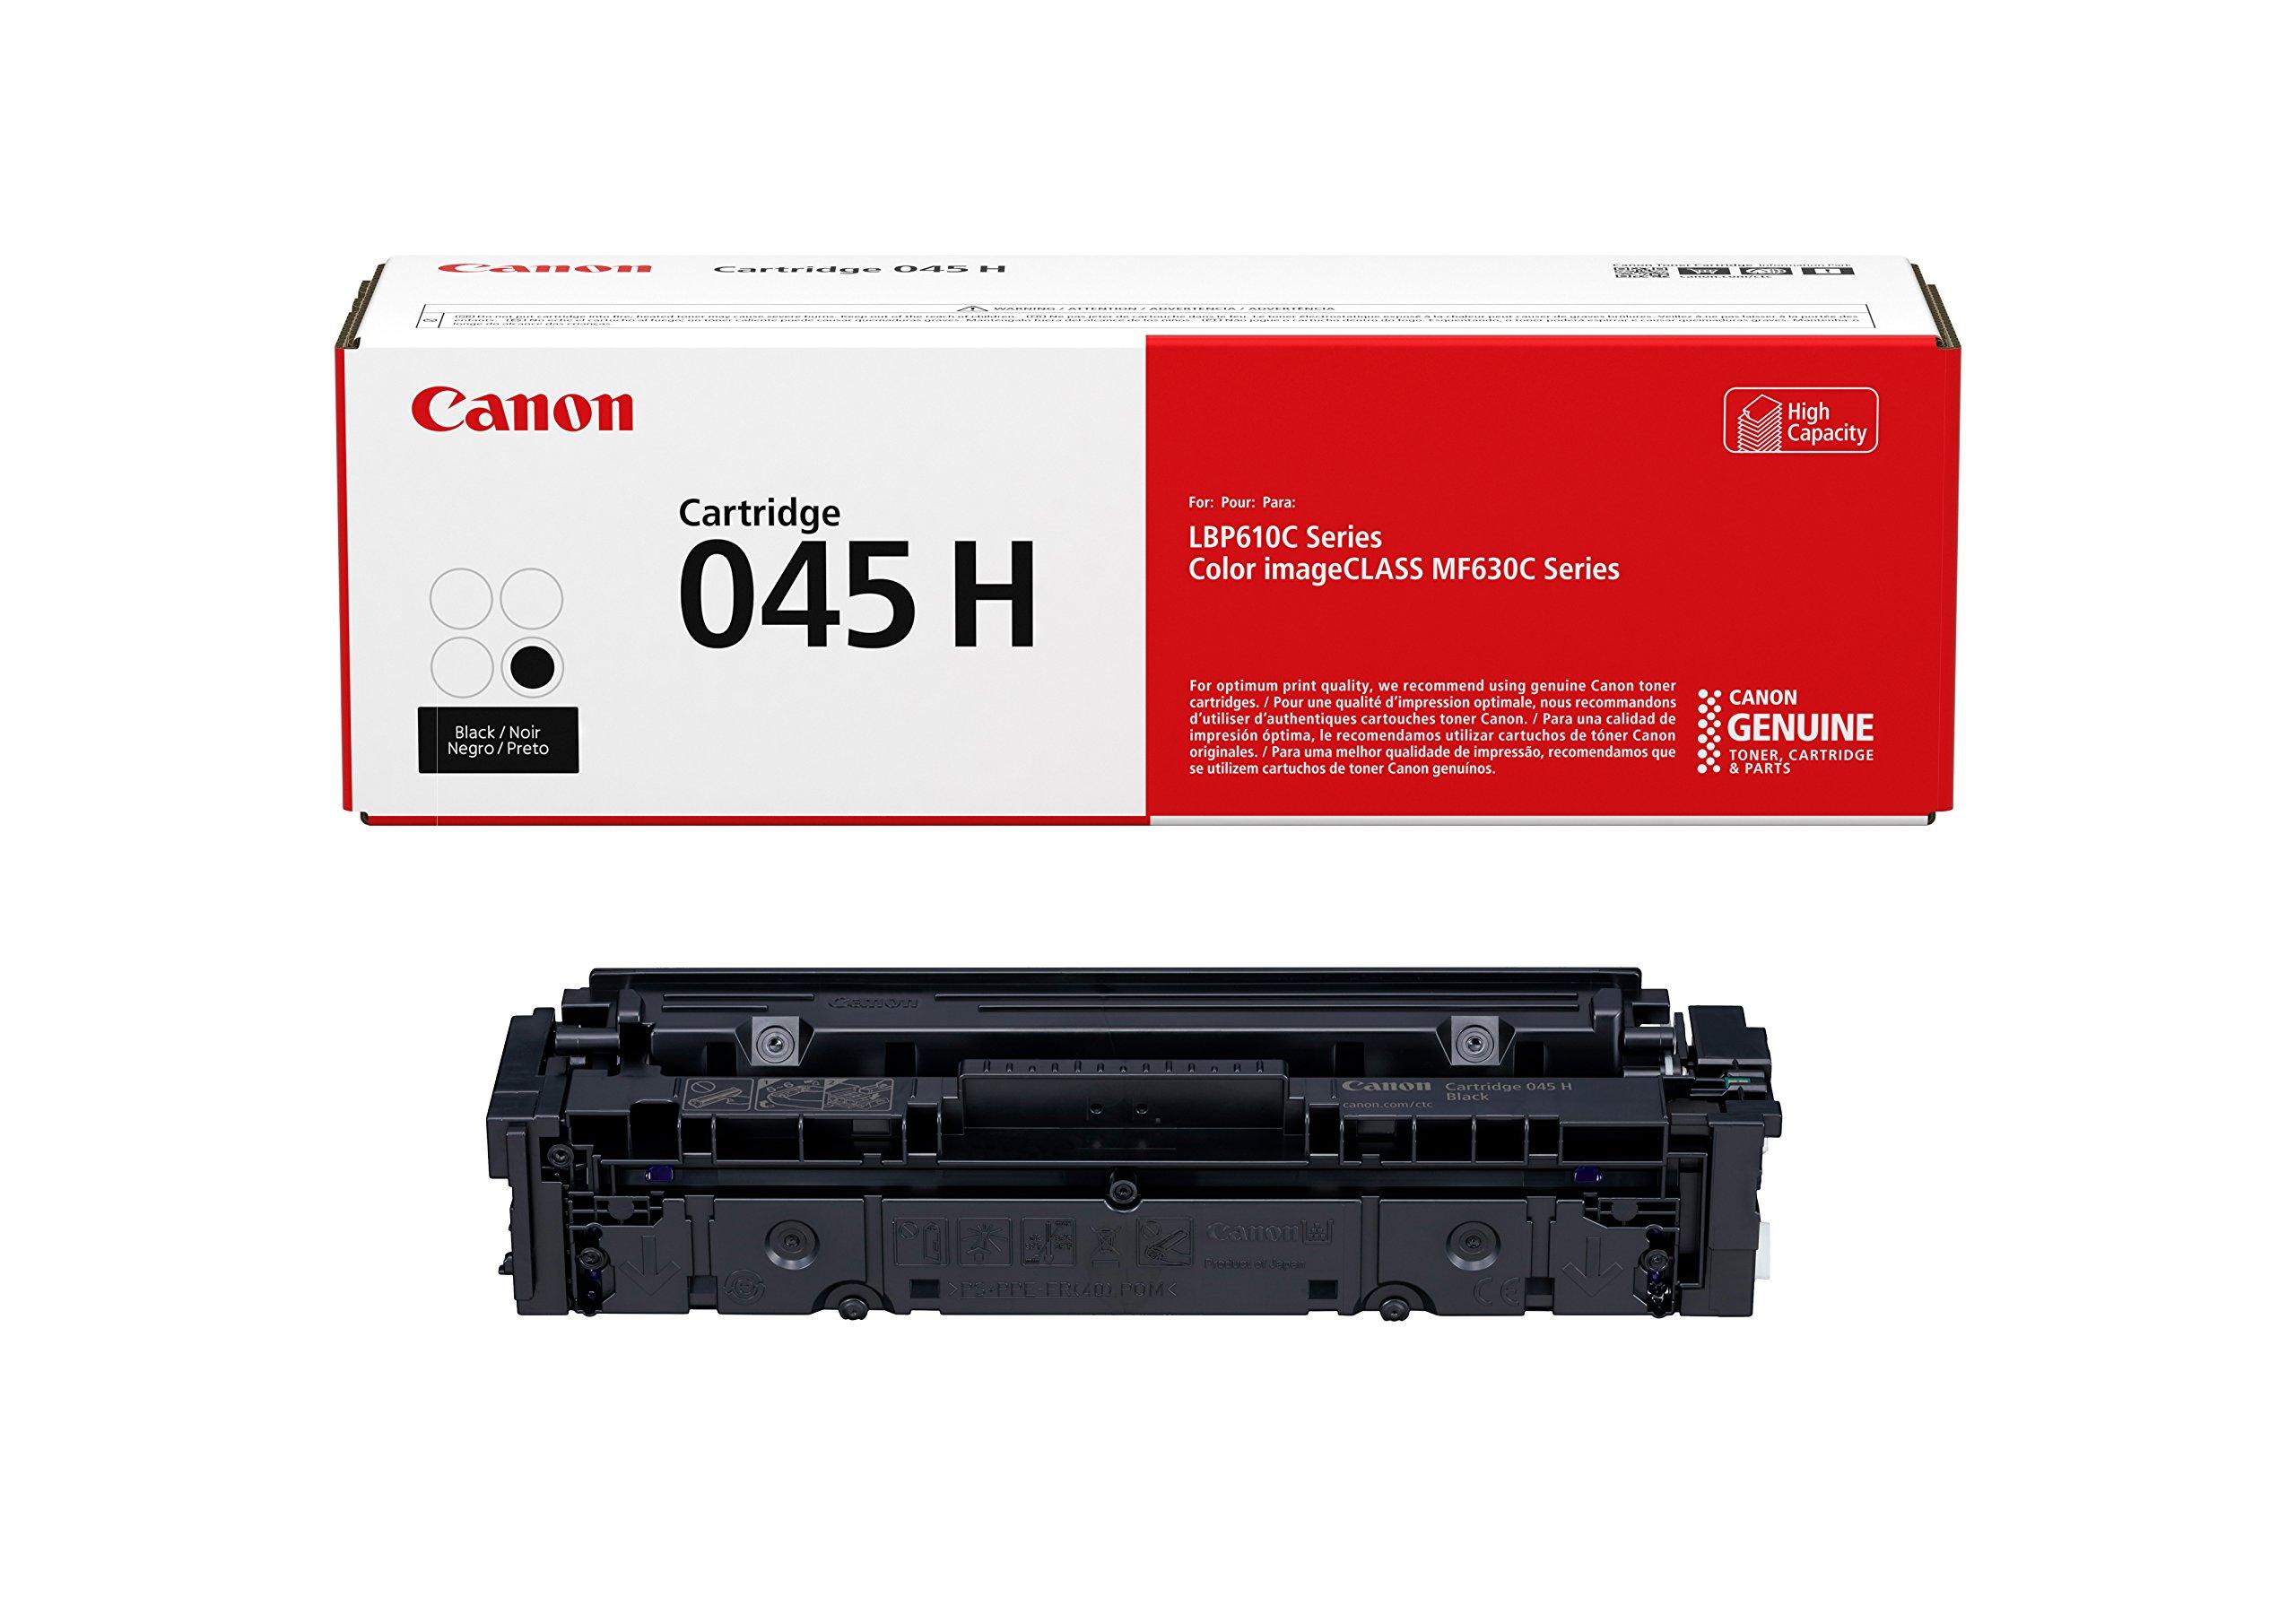 Toner Original Canon 045 Black Alta Capacidad 1 Pack Para Color Imageclass Mf634cdw Mf632cdw Lbp612cdw Laser